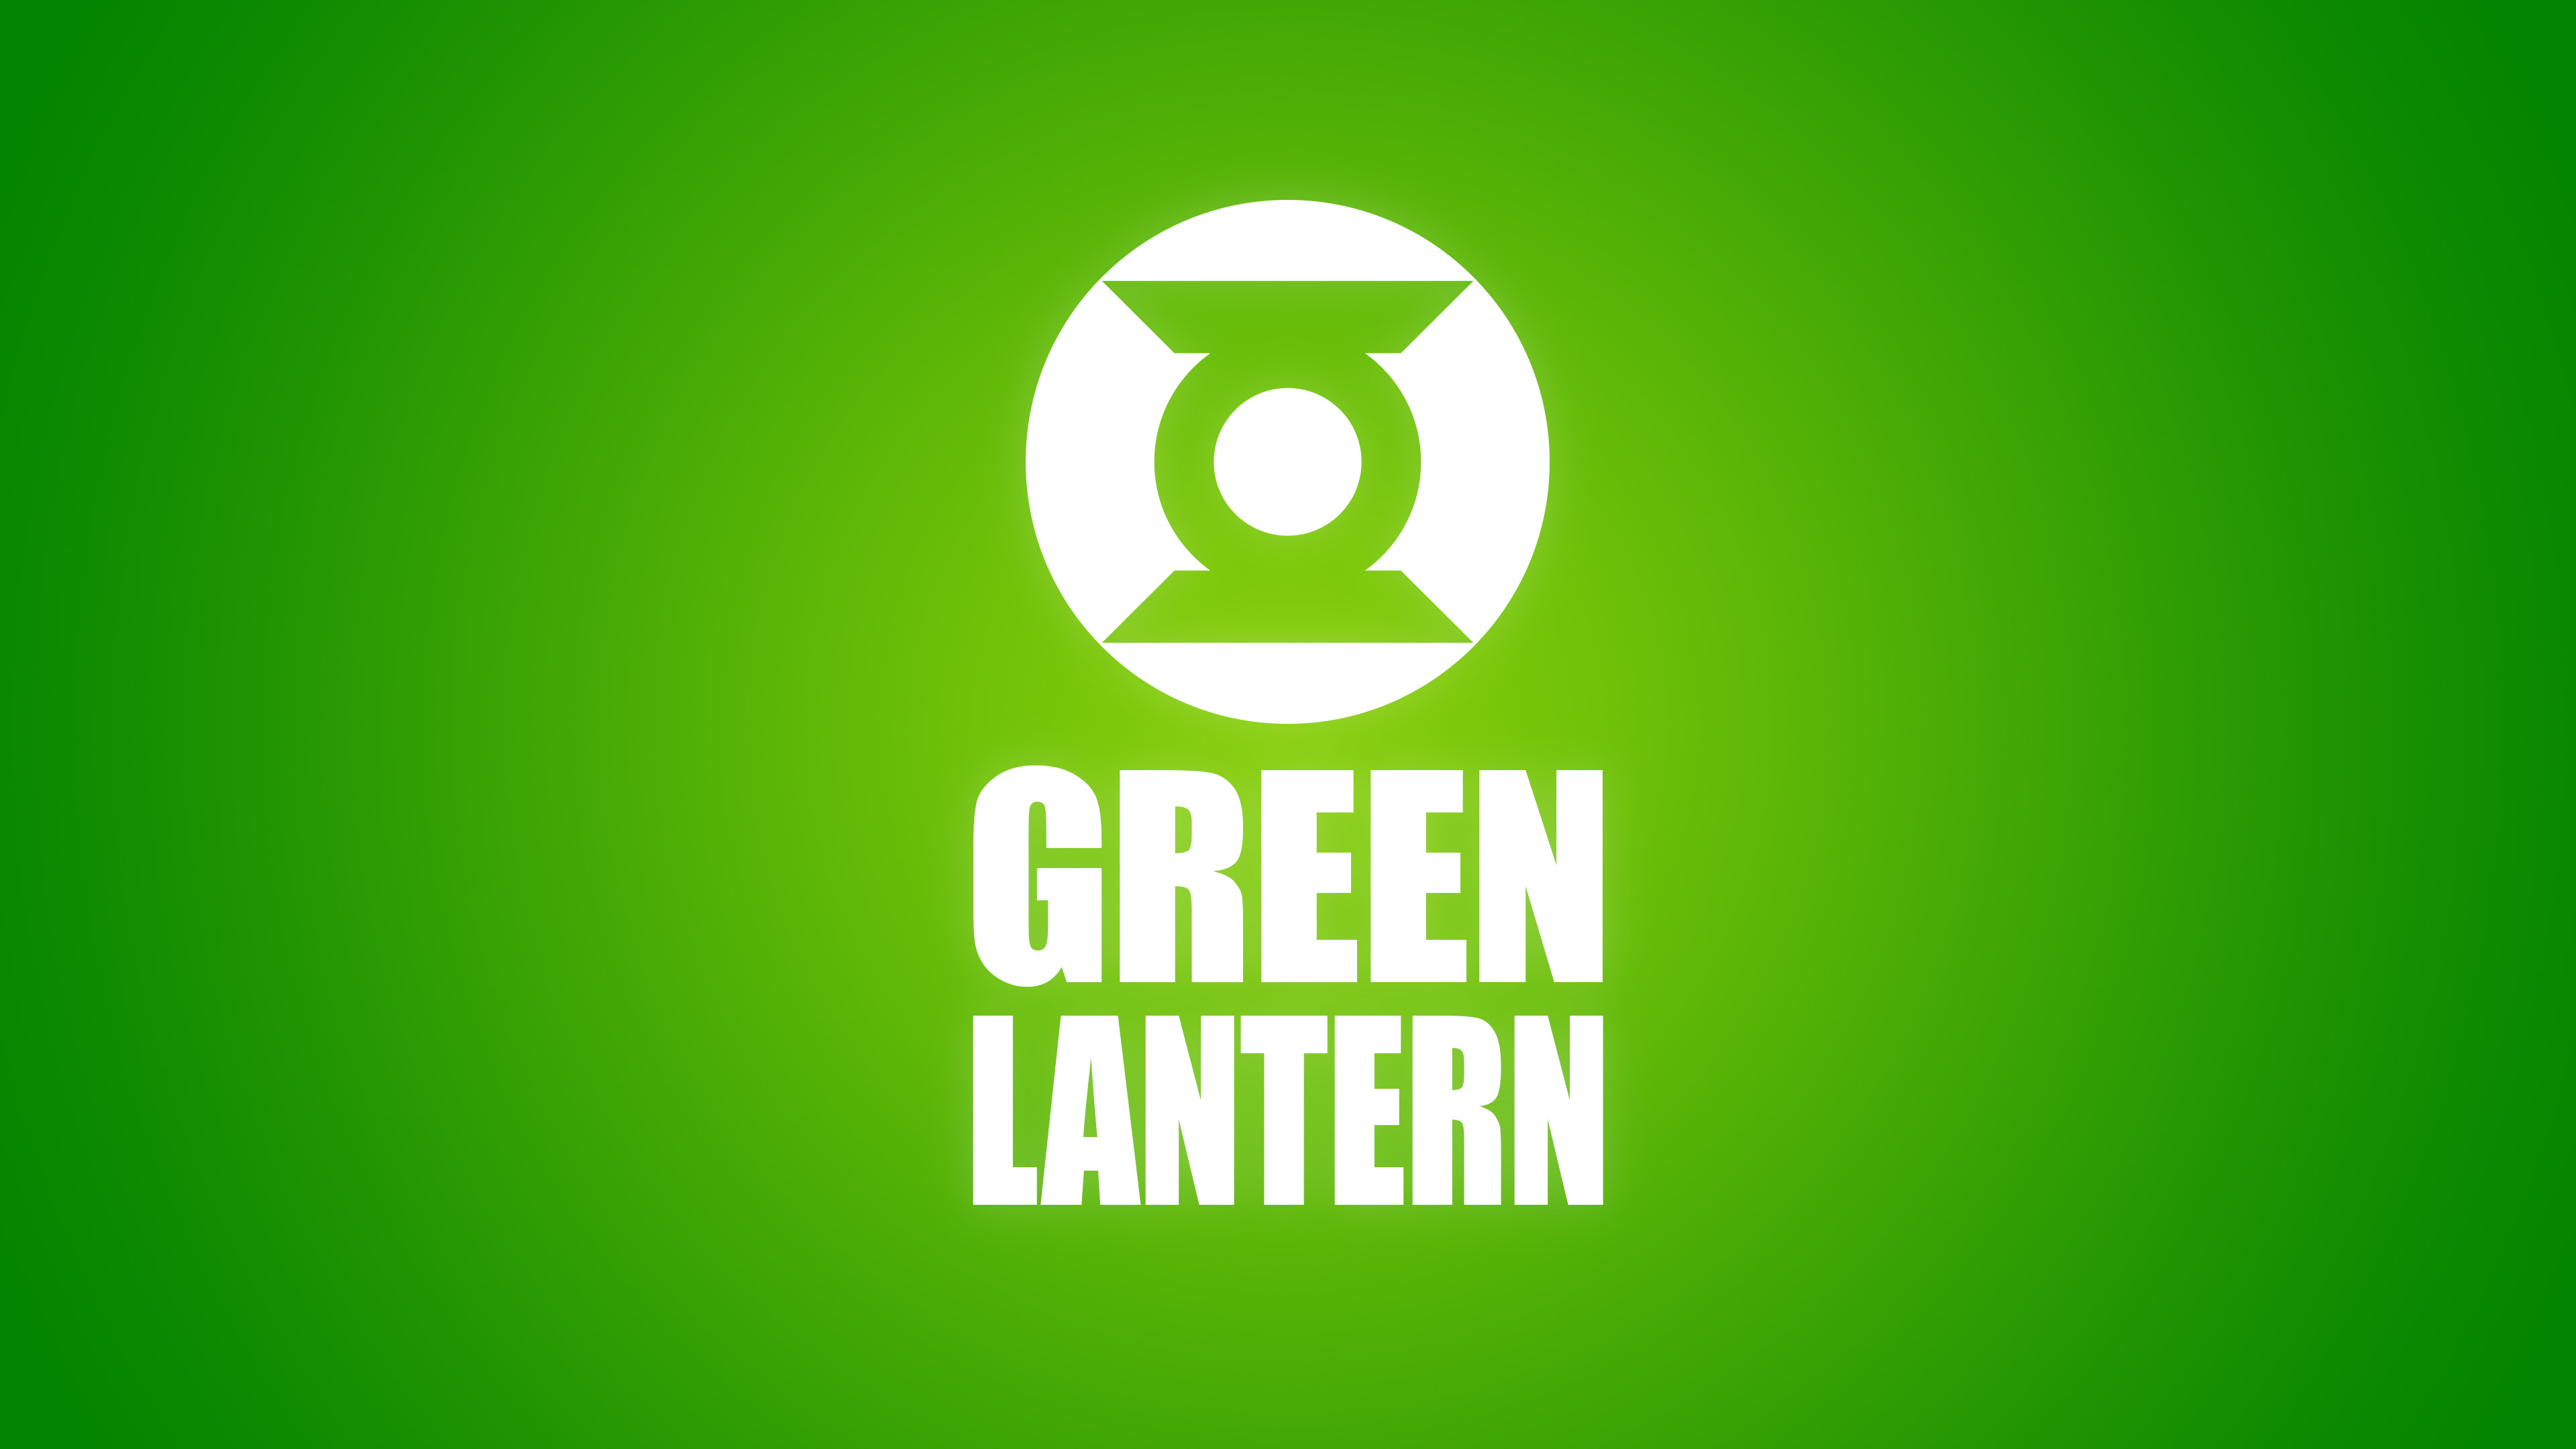 Wallpaper 4k Green Lantern Logo 4k 4k Wallpapers Artist Wallpapers Artwork Wallpapers Deviantart Wallpapers Digital Art Wallpapers Green Lantern Wallpapers Hd Wallpapers Logo Wallpapers